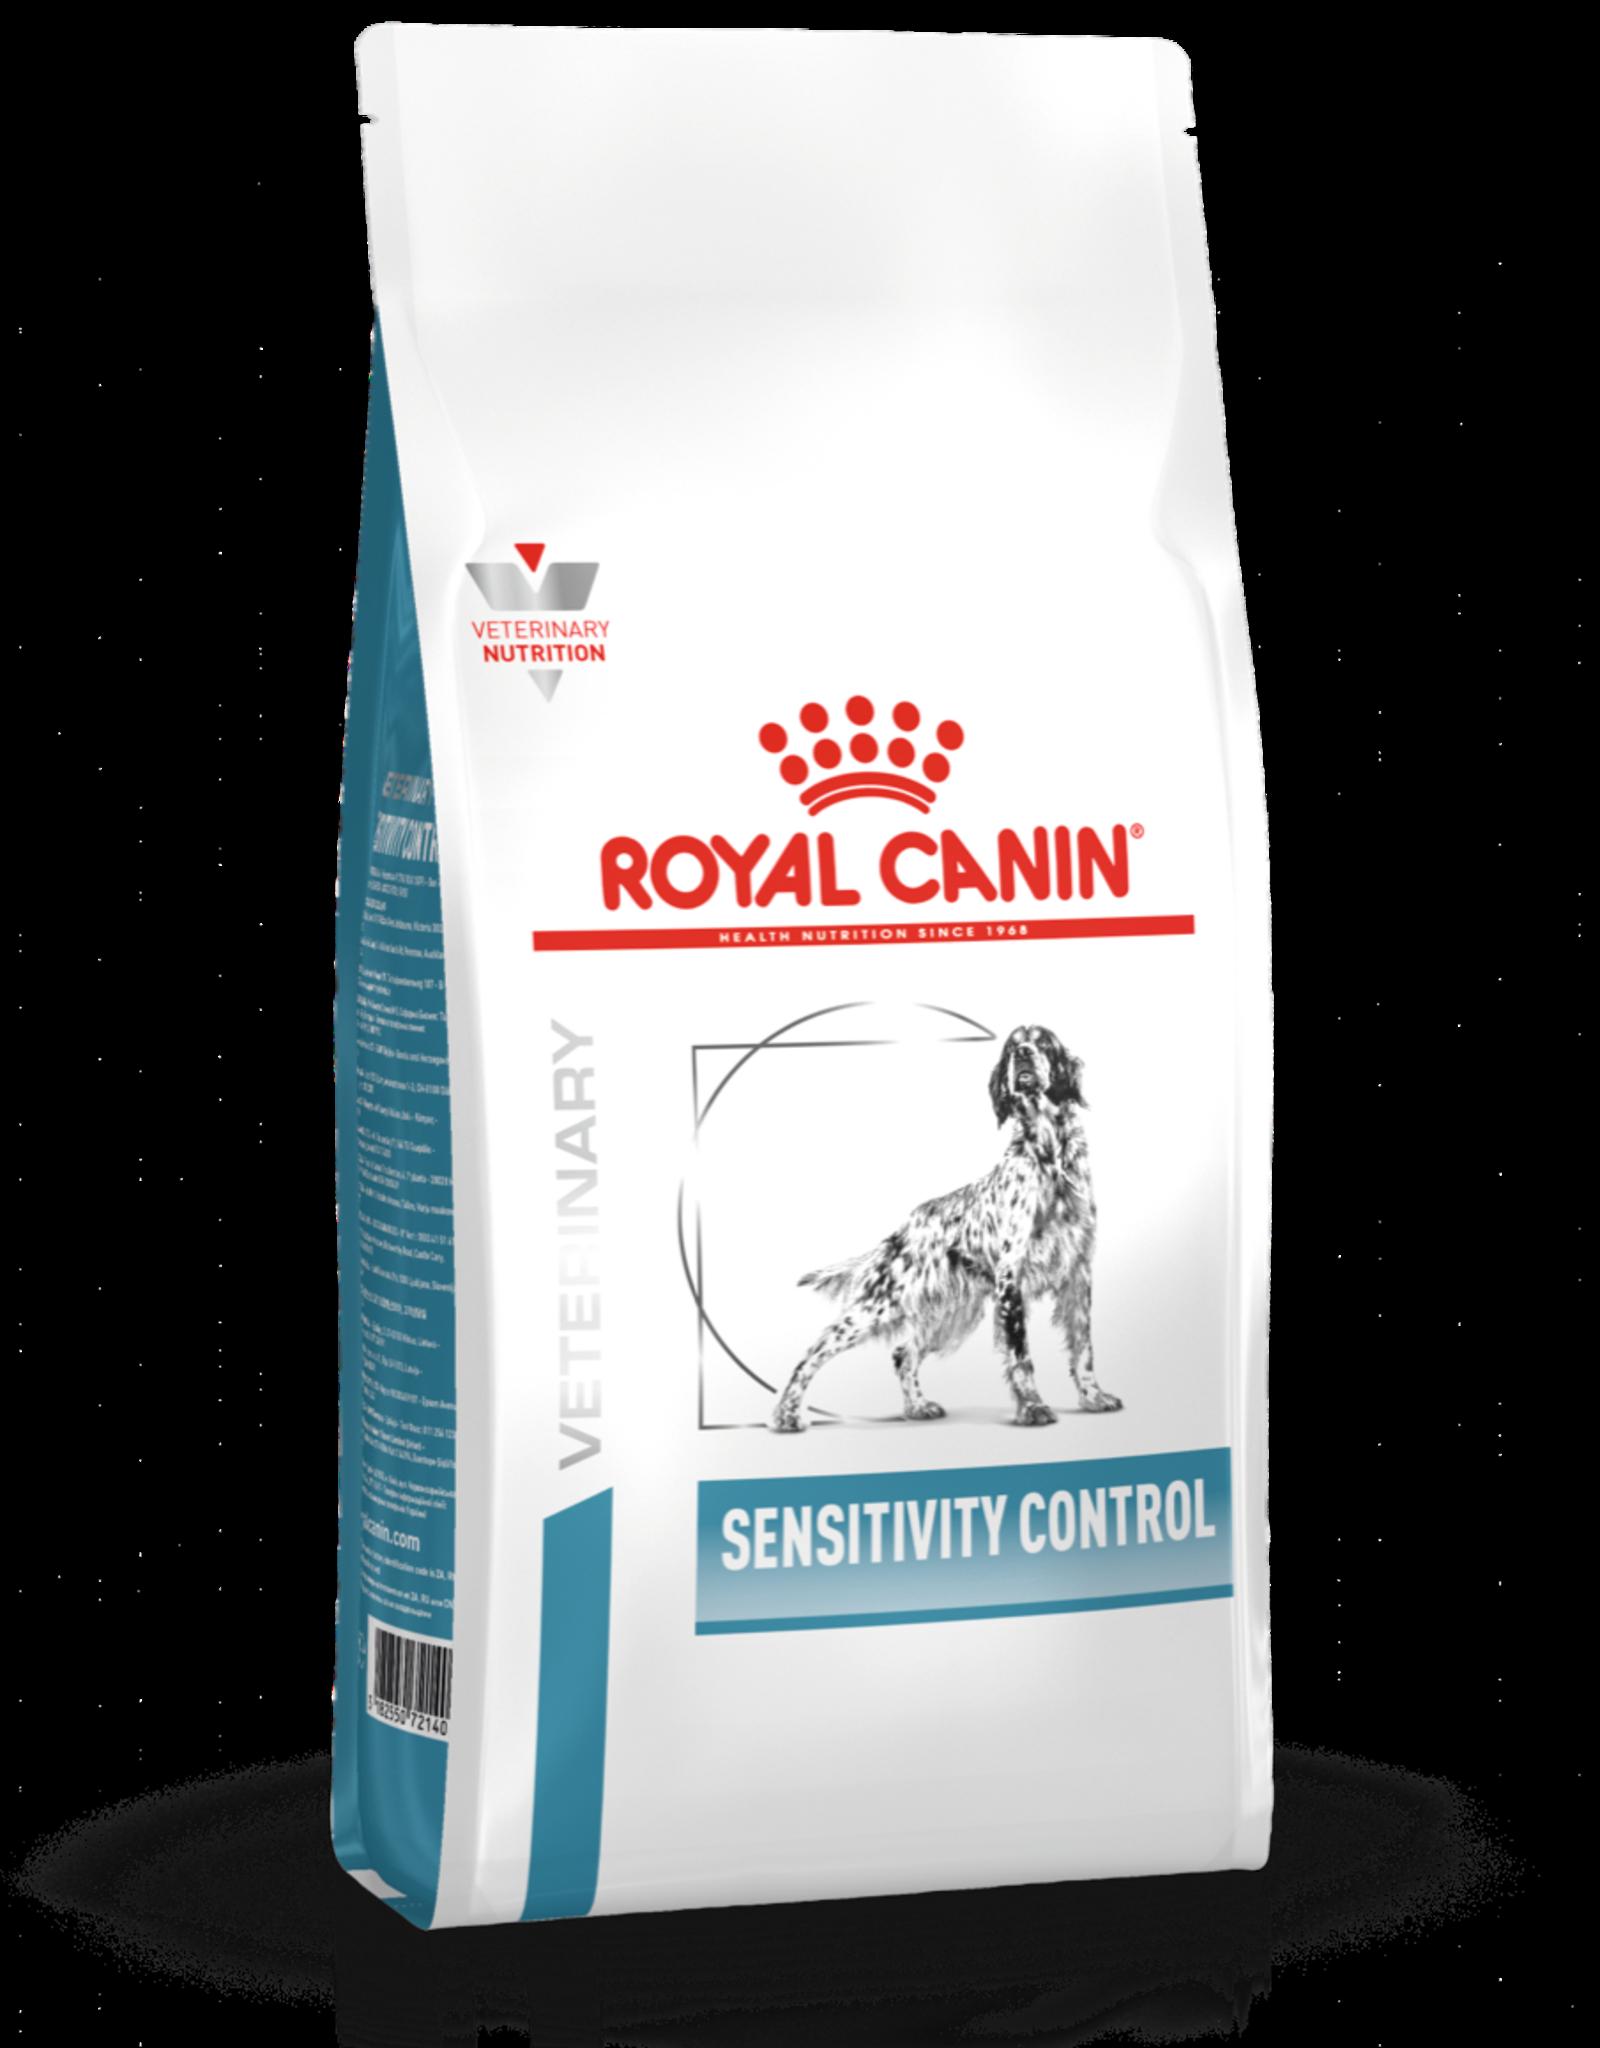 Royal Canin Royal Canin Sensitivity Control Hond Eend 7kg